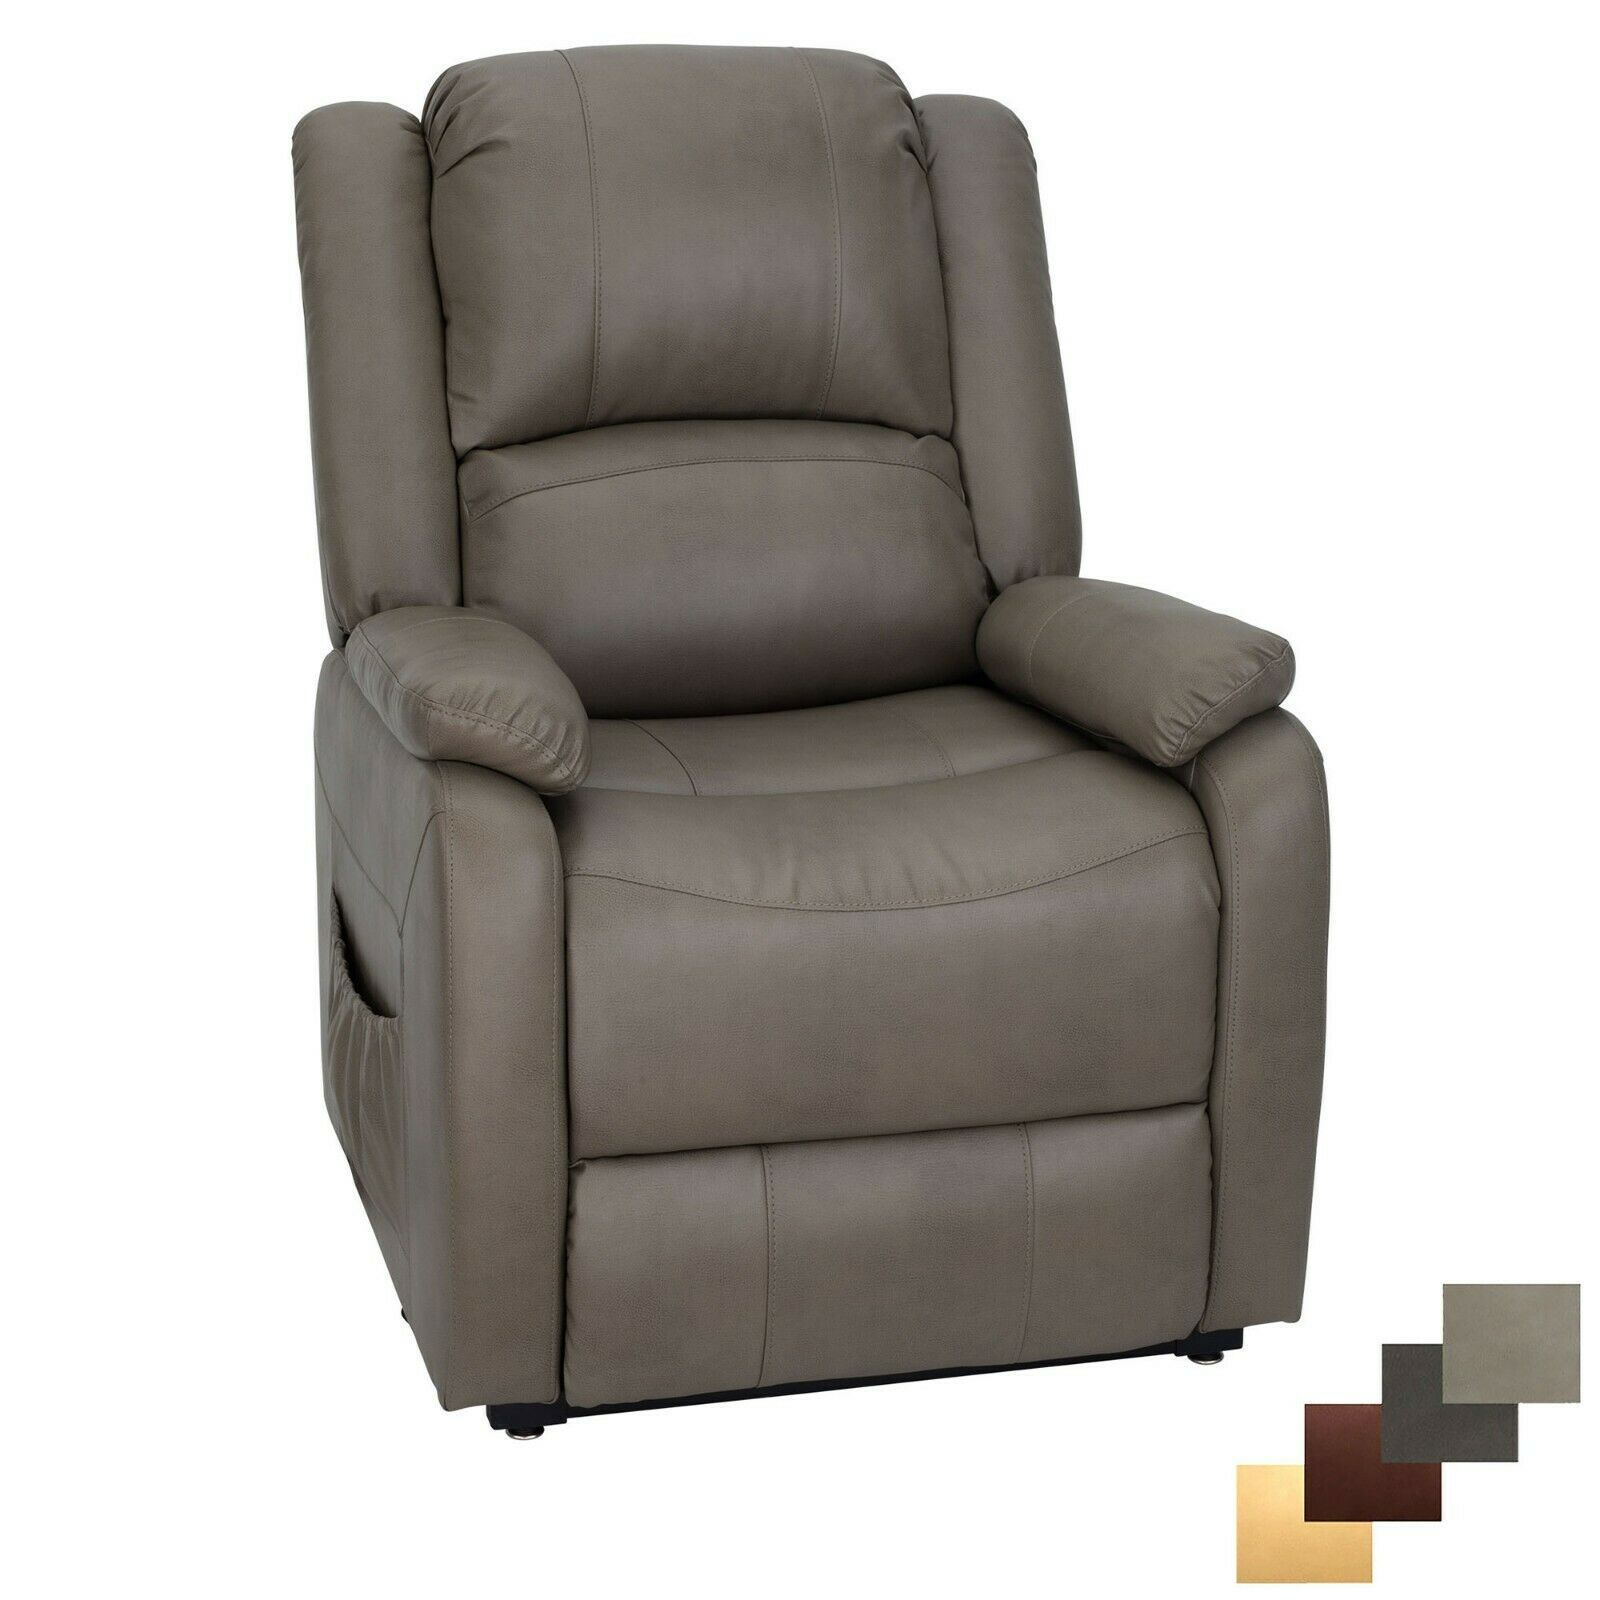 RecPro Charles 30  RV Handicap Power Lift Chair   RV Furniture   Putty